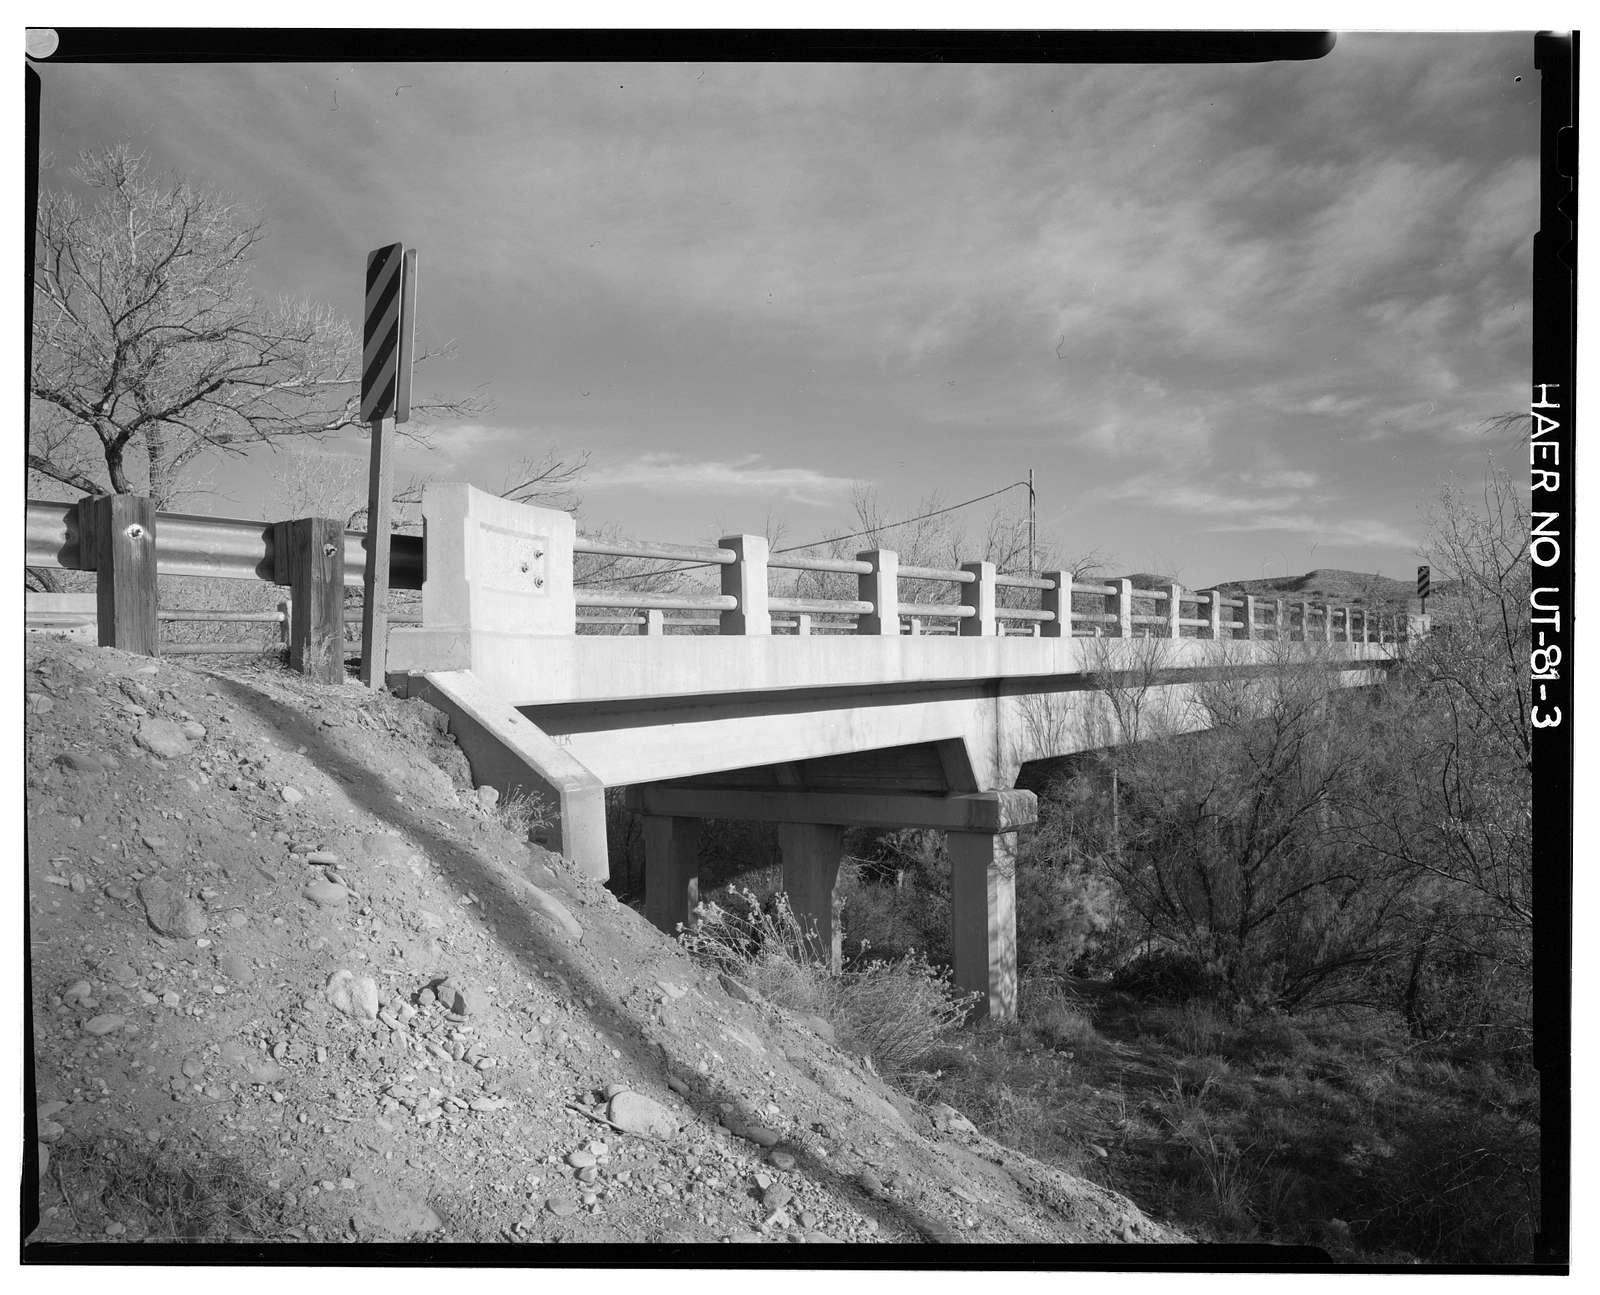 La Verkin Creek Bridge, Spanning La Verkin Creek on State Route 17, 0.7 miles northwest of La Verkin , La Verkin, Washington County, UT